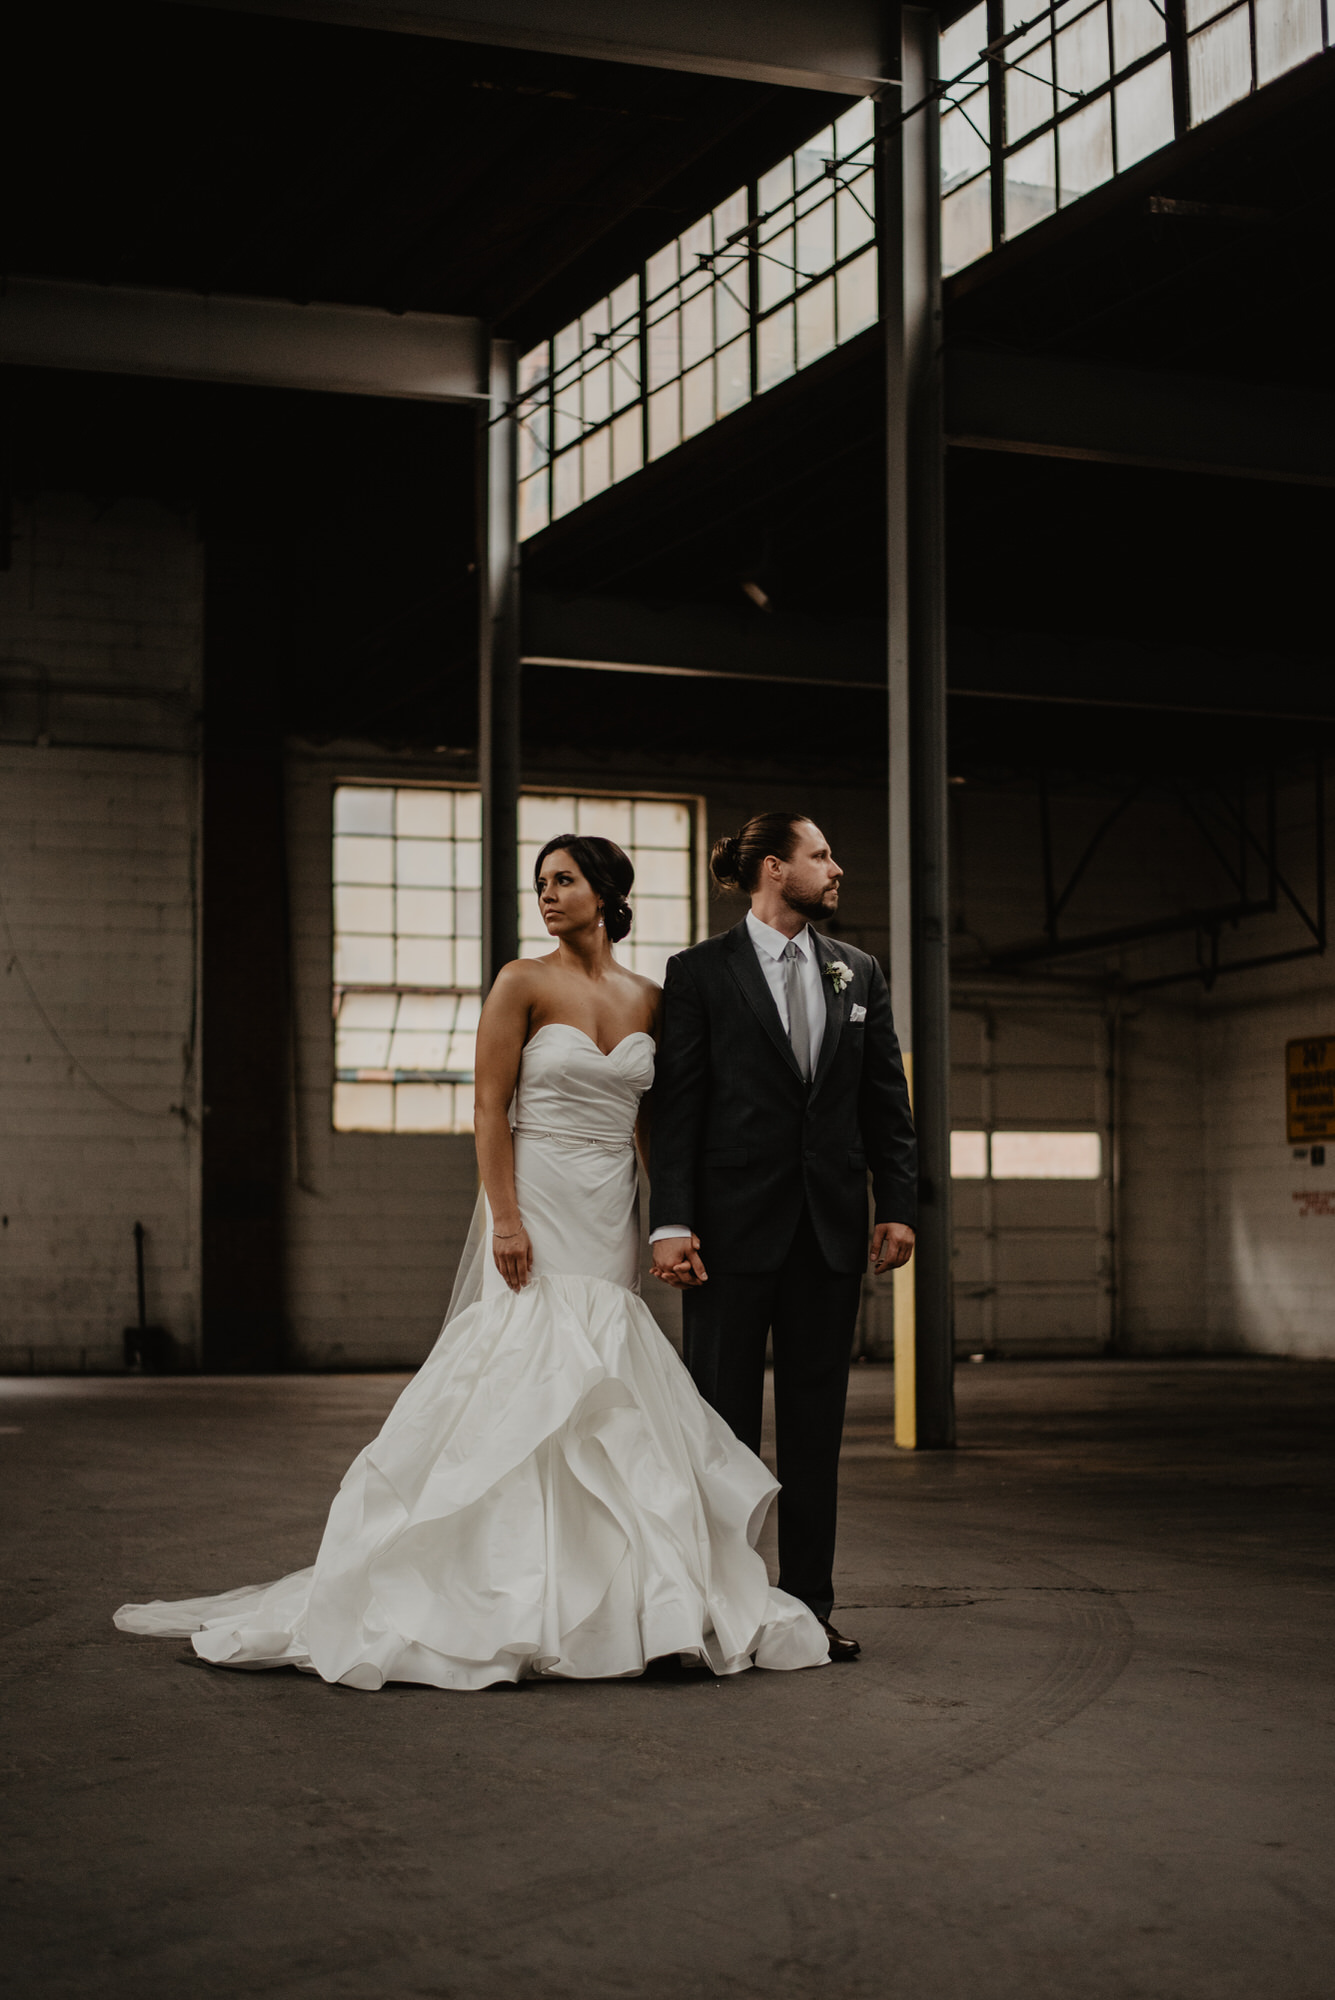 Kaylie_Sirek_Photography_Grand_Island_Kearney_Hastings_Lincoln_Nebraska_Wedding_Engagement_Grandma_Grandparent_Delray_Downtown_DowntownLincoln_LNK_Emotional_Bride_Groom_Photographer_27.jpg